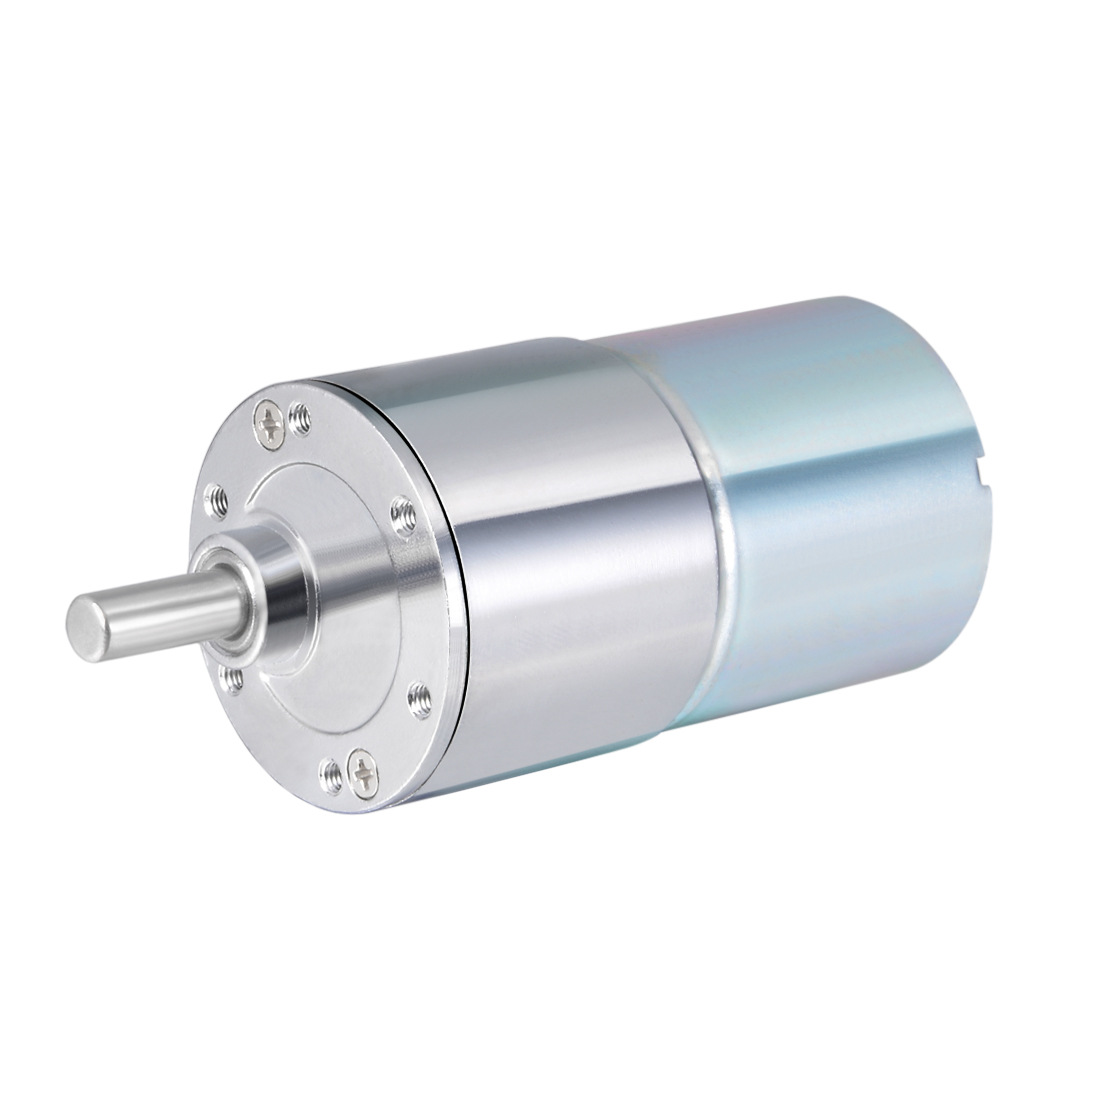 24V DC 30 RPM Gear Motor High Torque Reduction Gearbox Eccentric Output Shaft